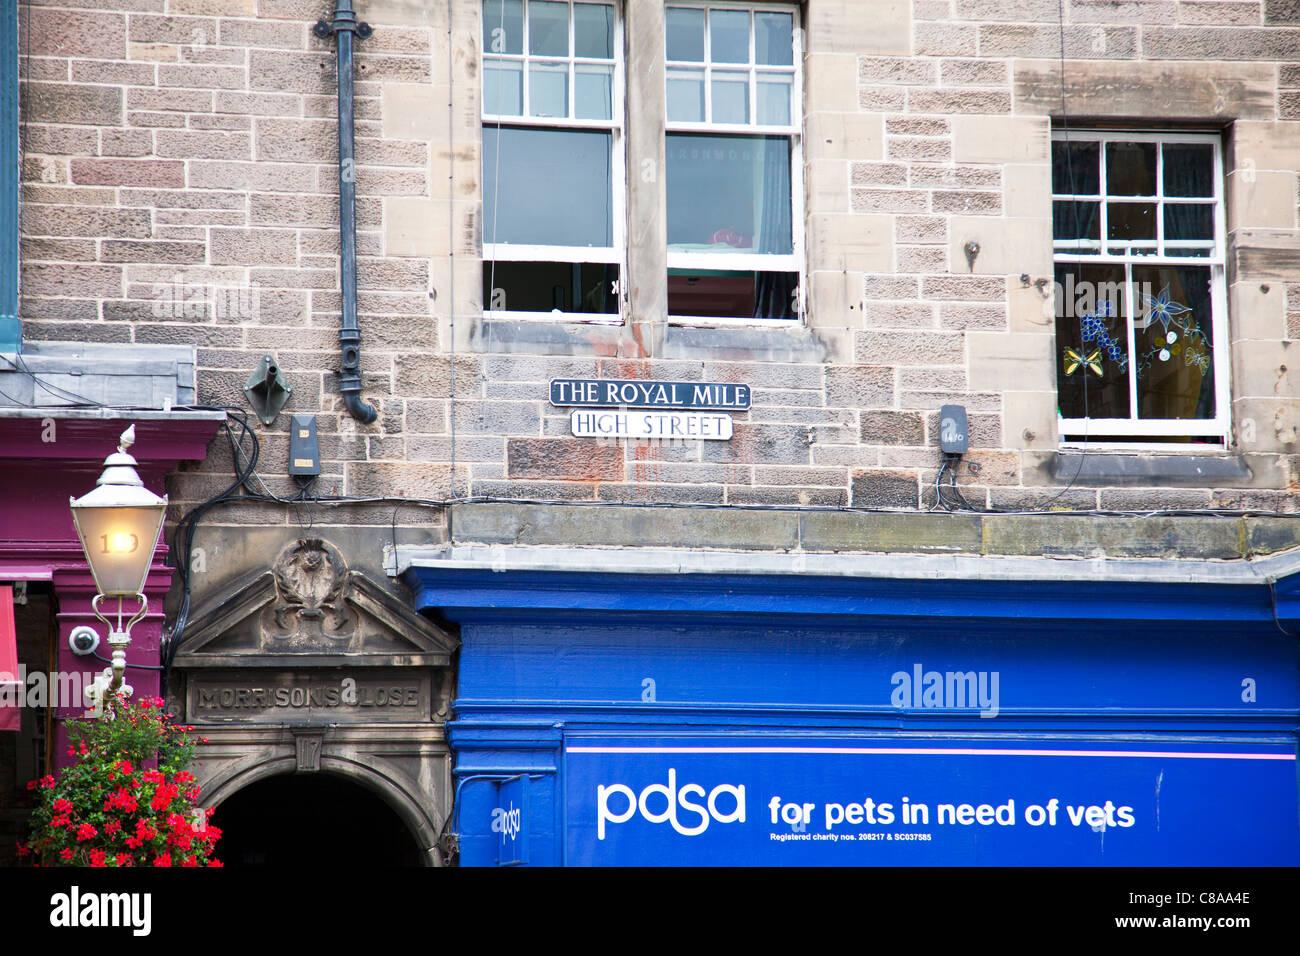 Edinburgh, Scotland, The Royal Mile High Street, PDSA pets in need of vets shop sign - Stock Image